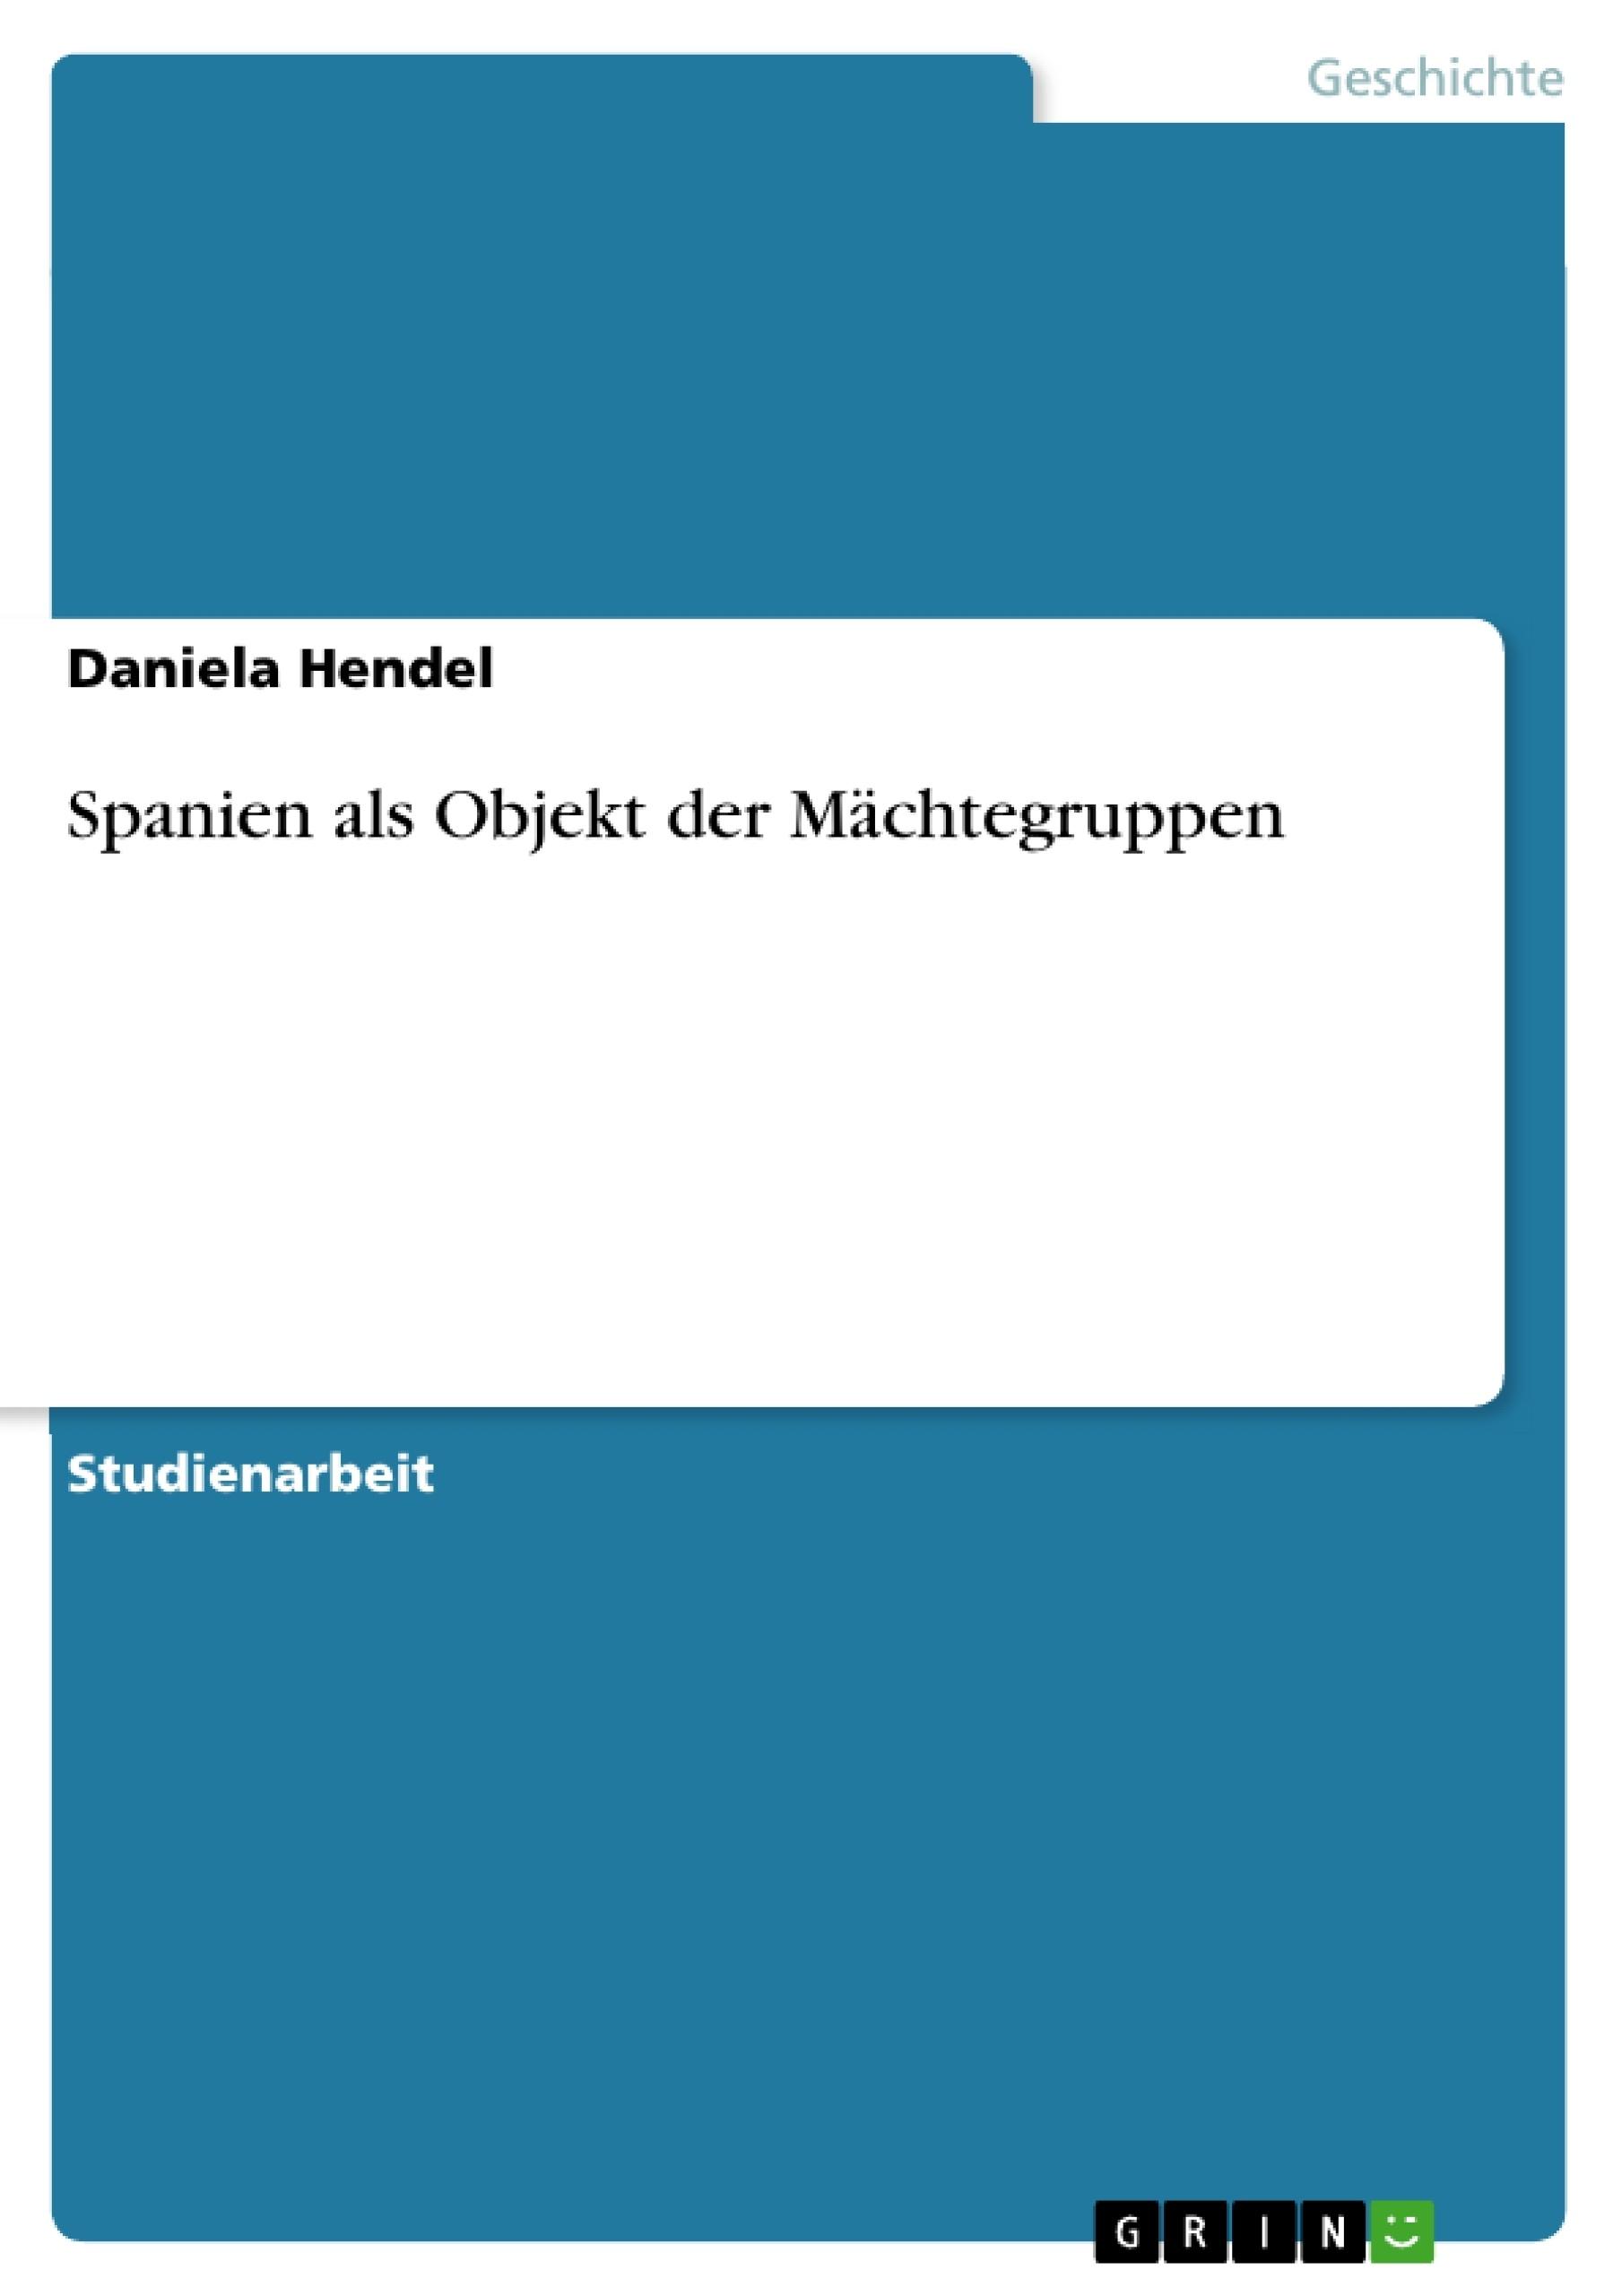 Titel: Spanien als Objekt der Mächtegruppen